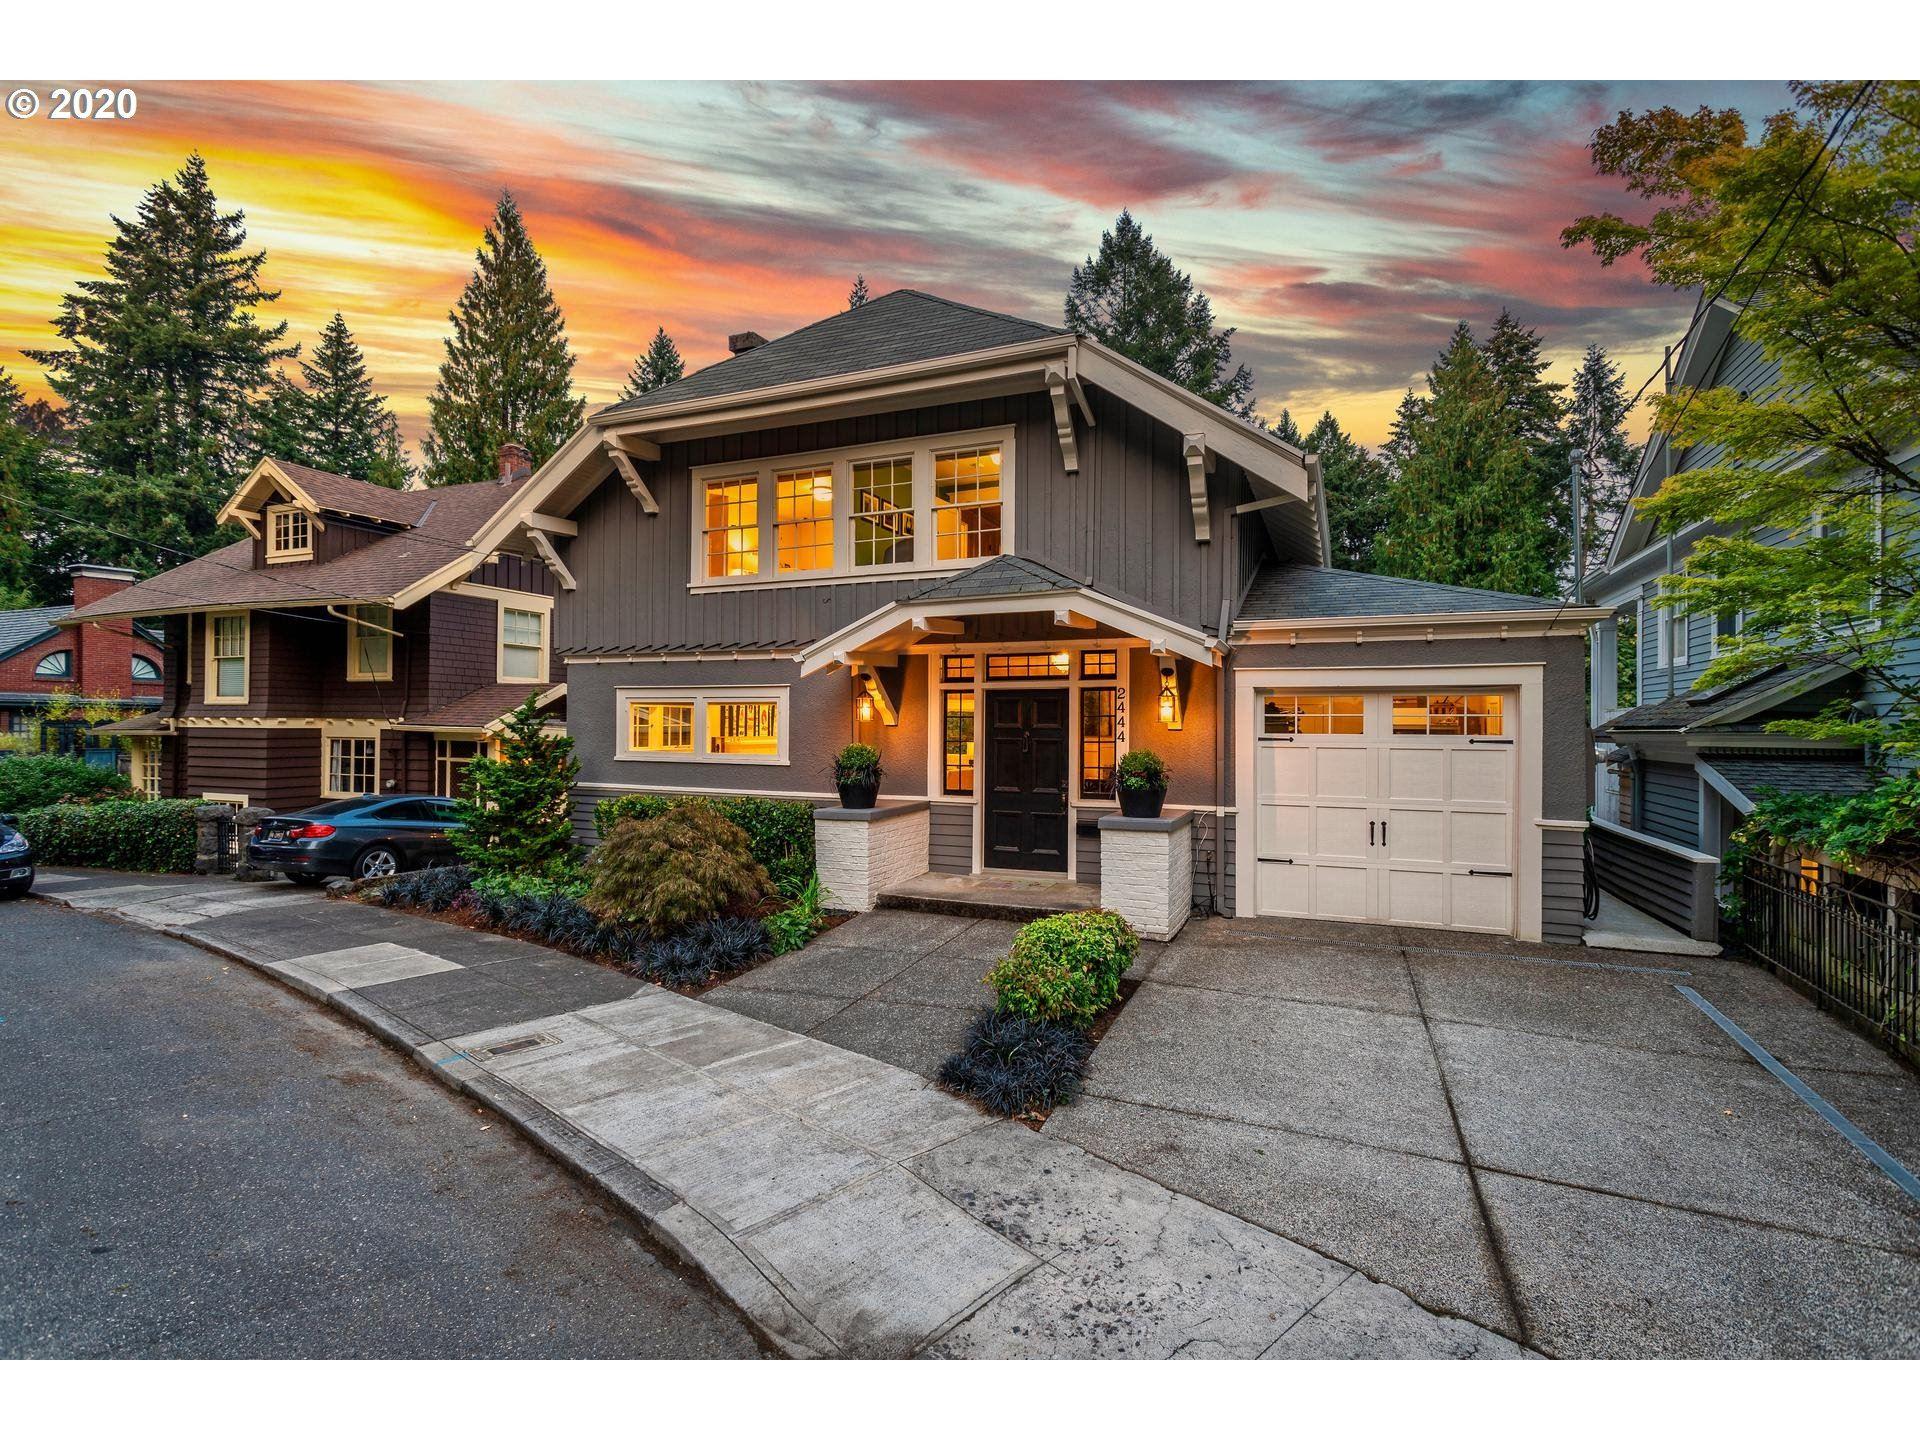 2444 SW SHERWOOD DR, Portland, OR 97201 - MLS#: 20207805